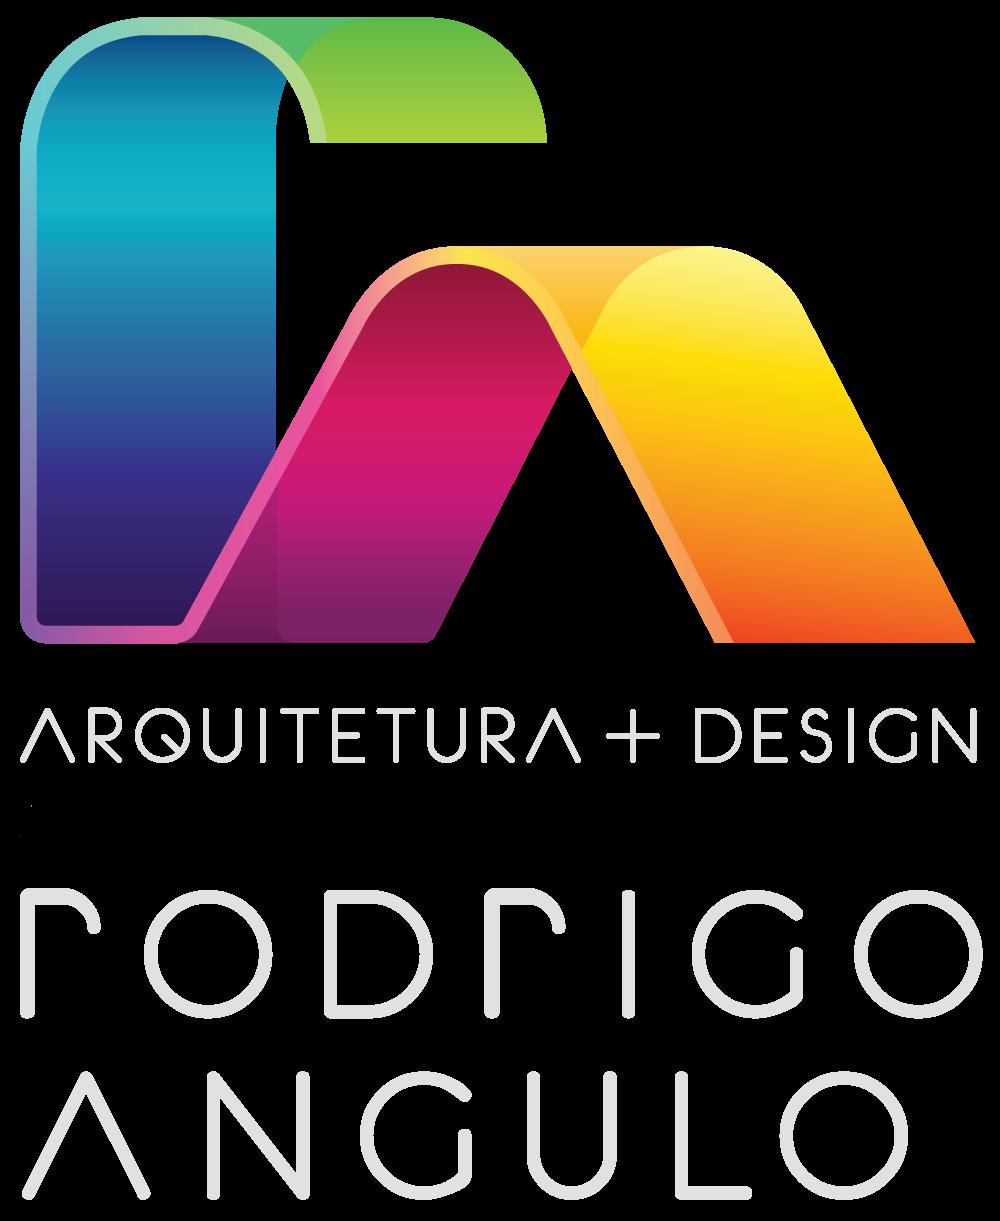 Arquiteto Rodrigo Angulo